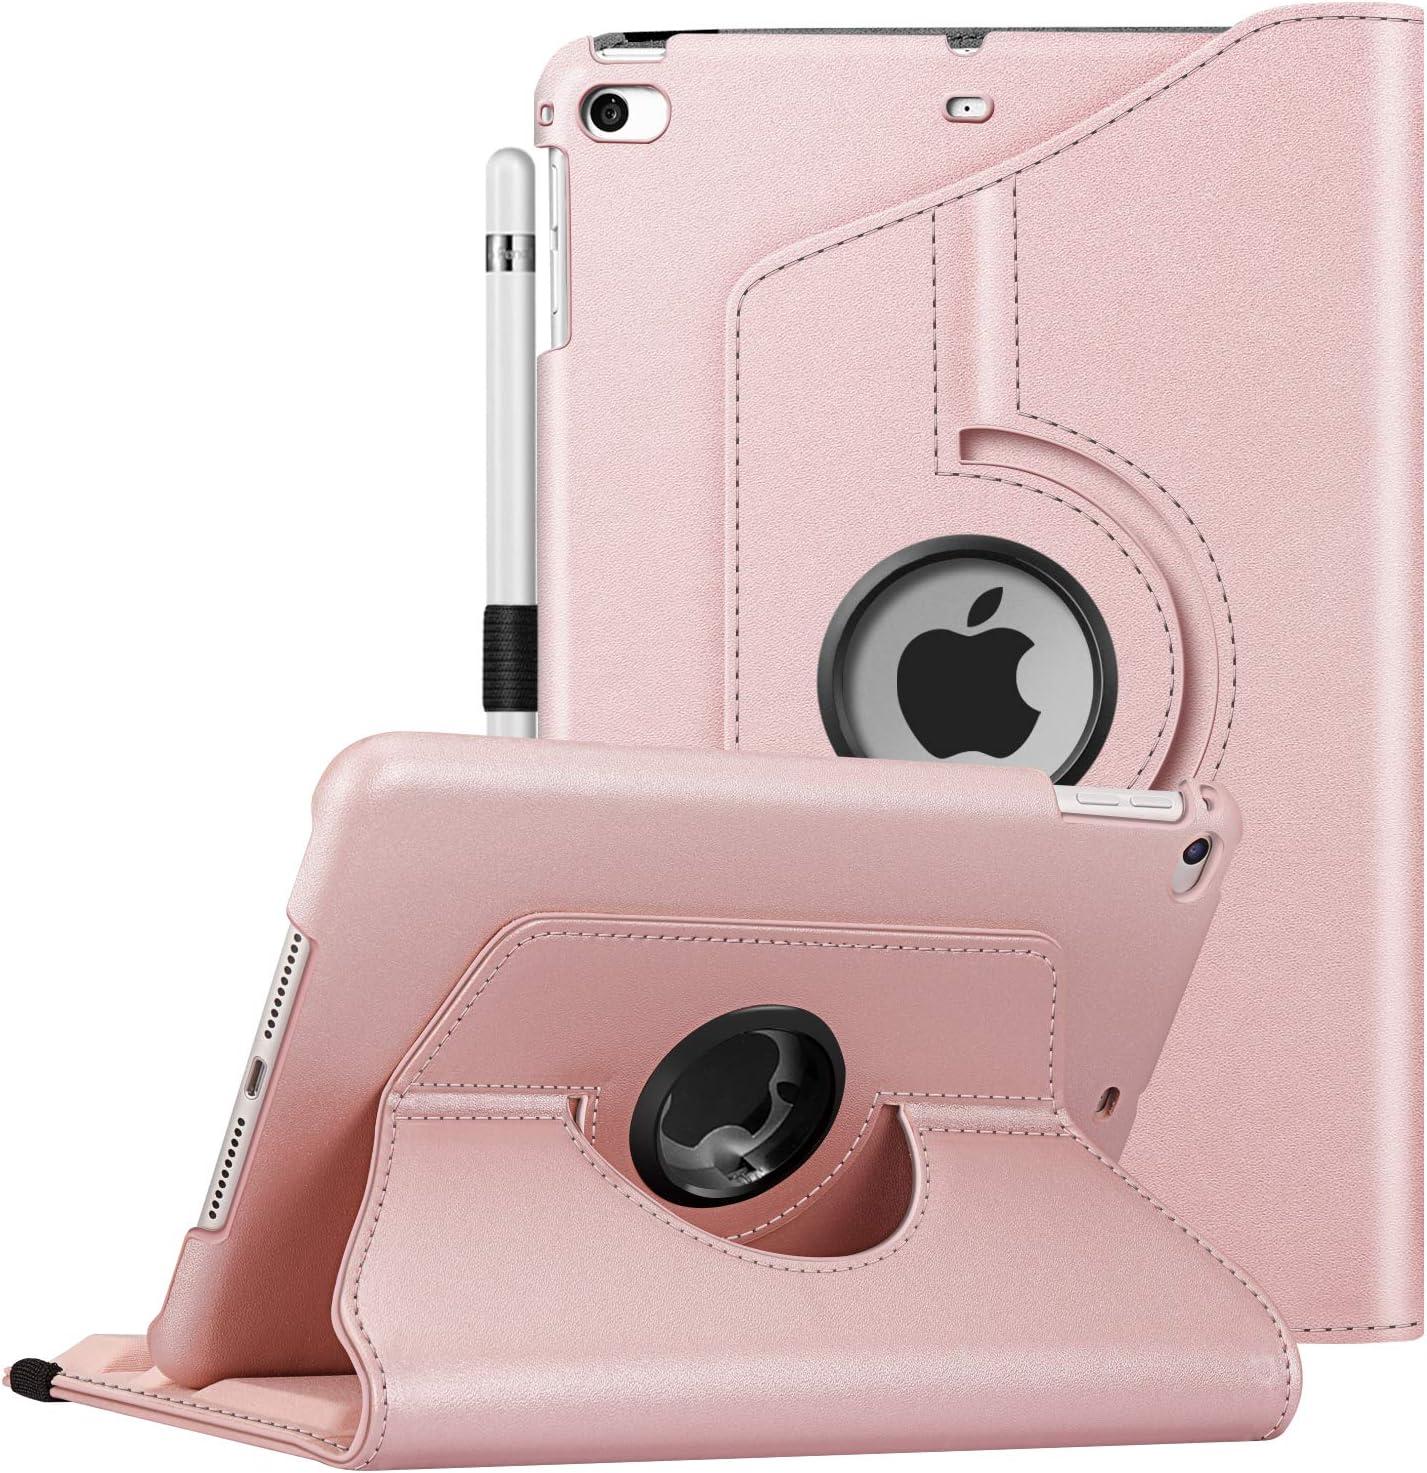 "Fintie Rotating Case for iPad Mini 5 2019 / iPad Mini 4-360 Degree Rotating Smart Stand Protective Back Cover, Auto Sleep/Wake Feature for 7.9"" iPad Mini 5th Generation, Rose Gold"